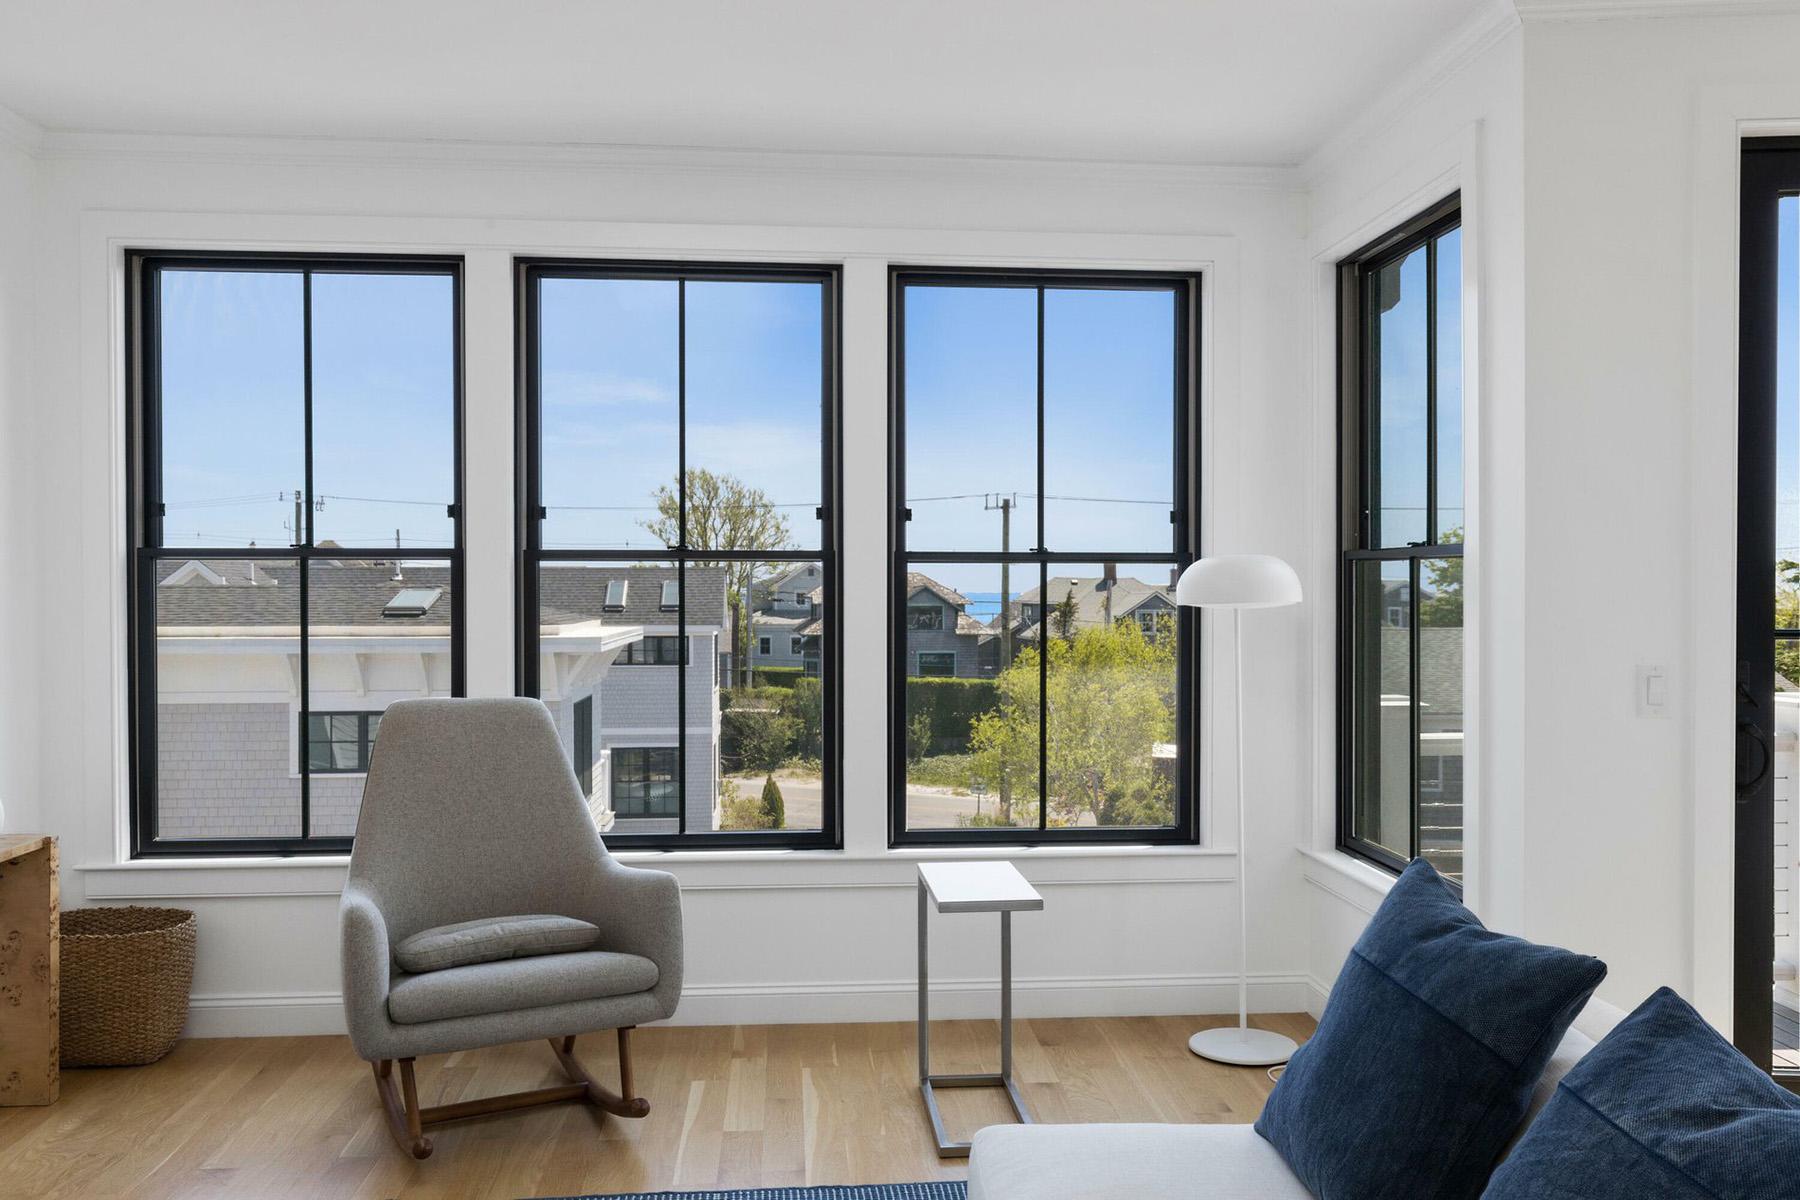 Sitting area with large black windows.